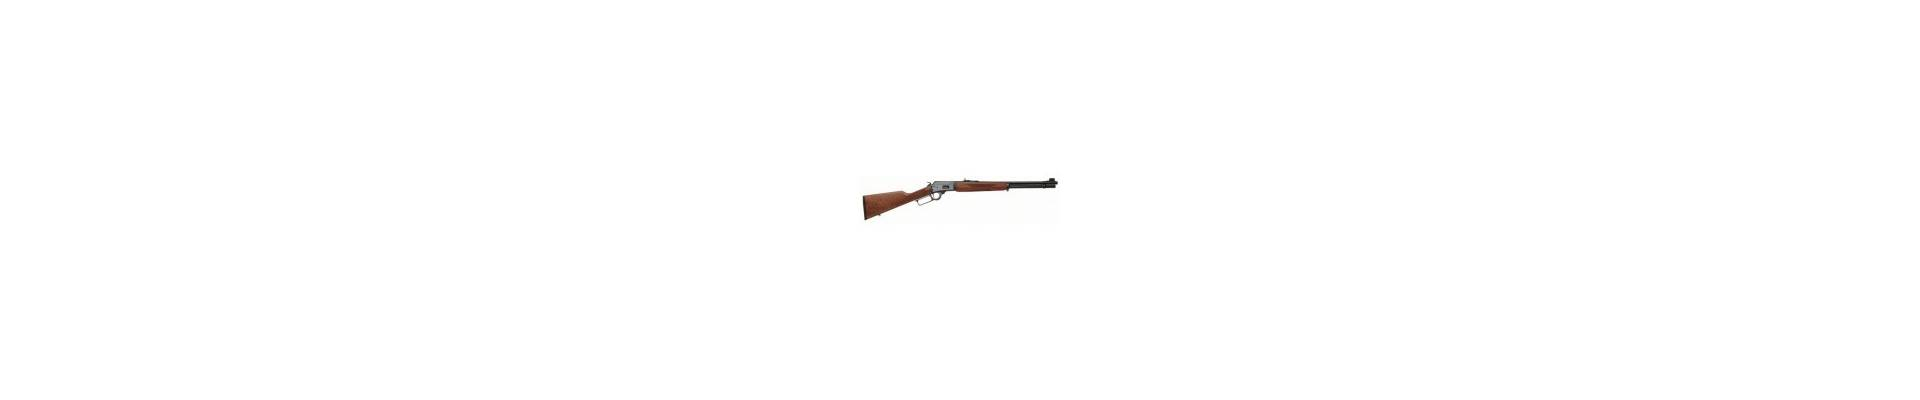 Rifles Palanca